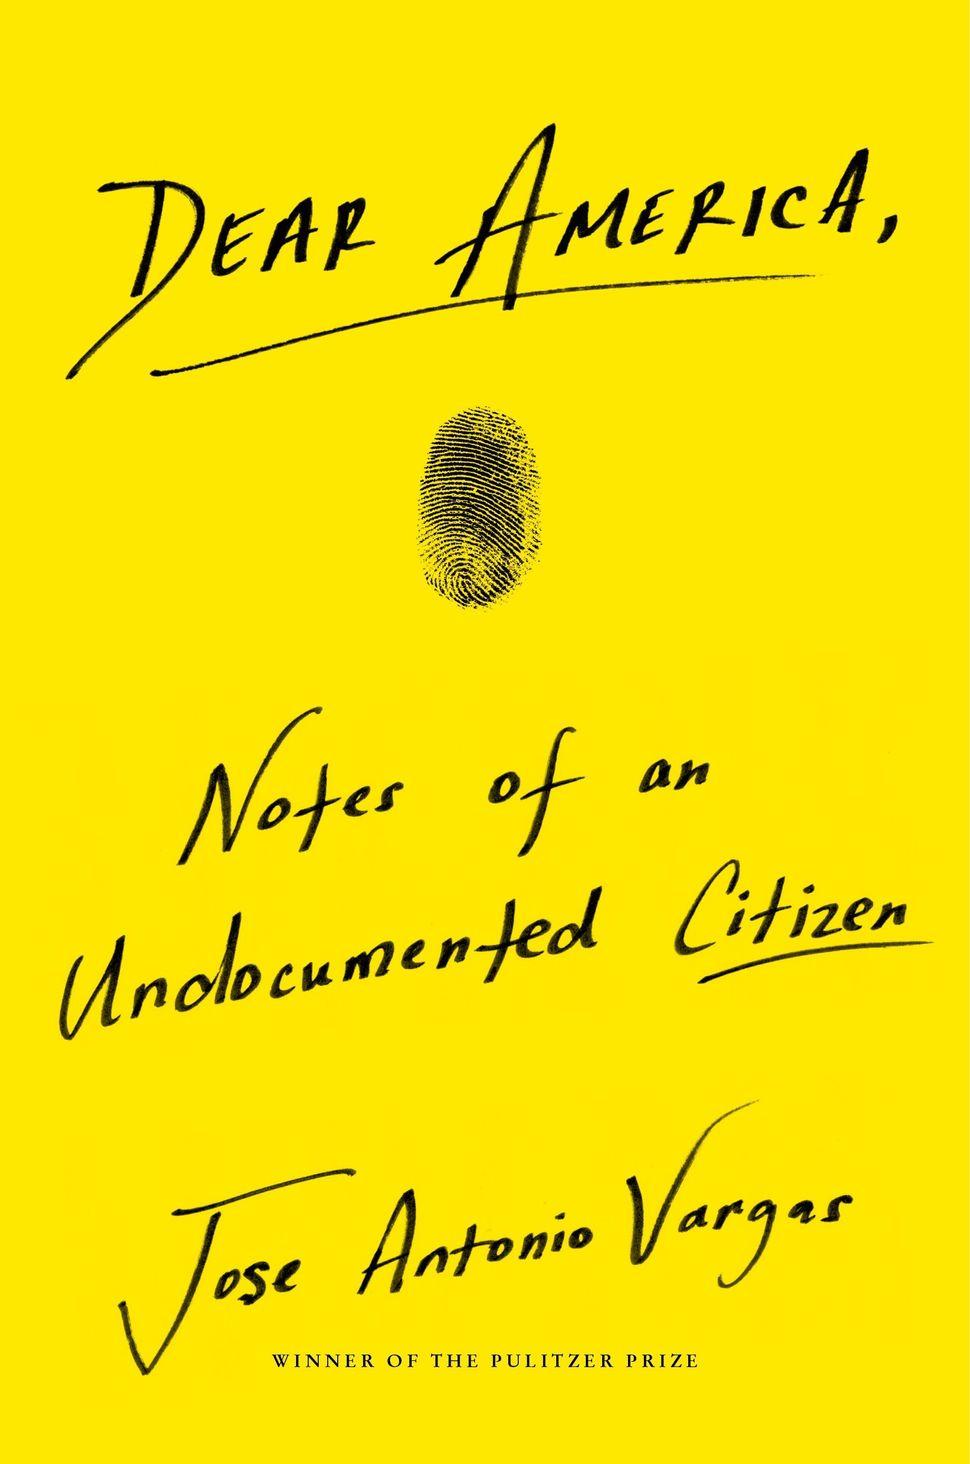 The memoir's bright yellow cover.